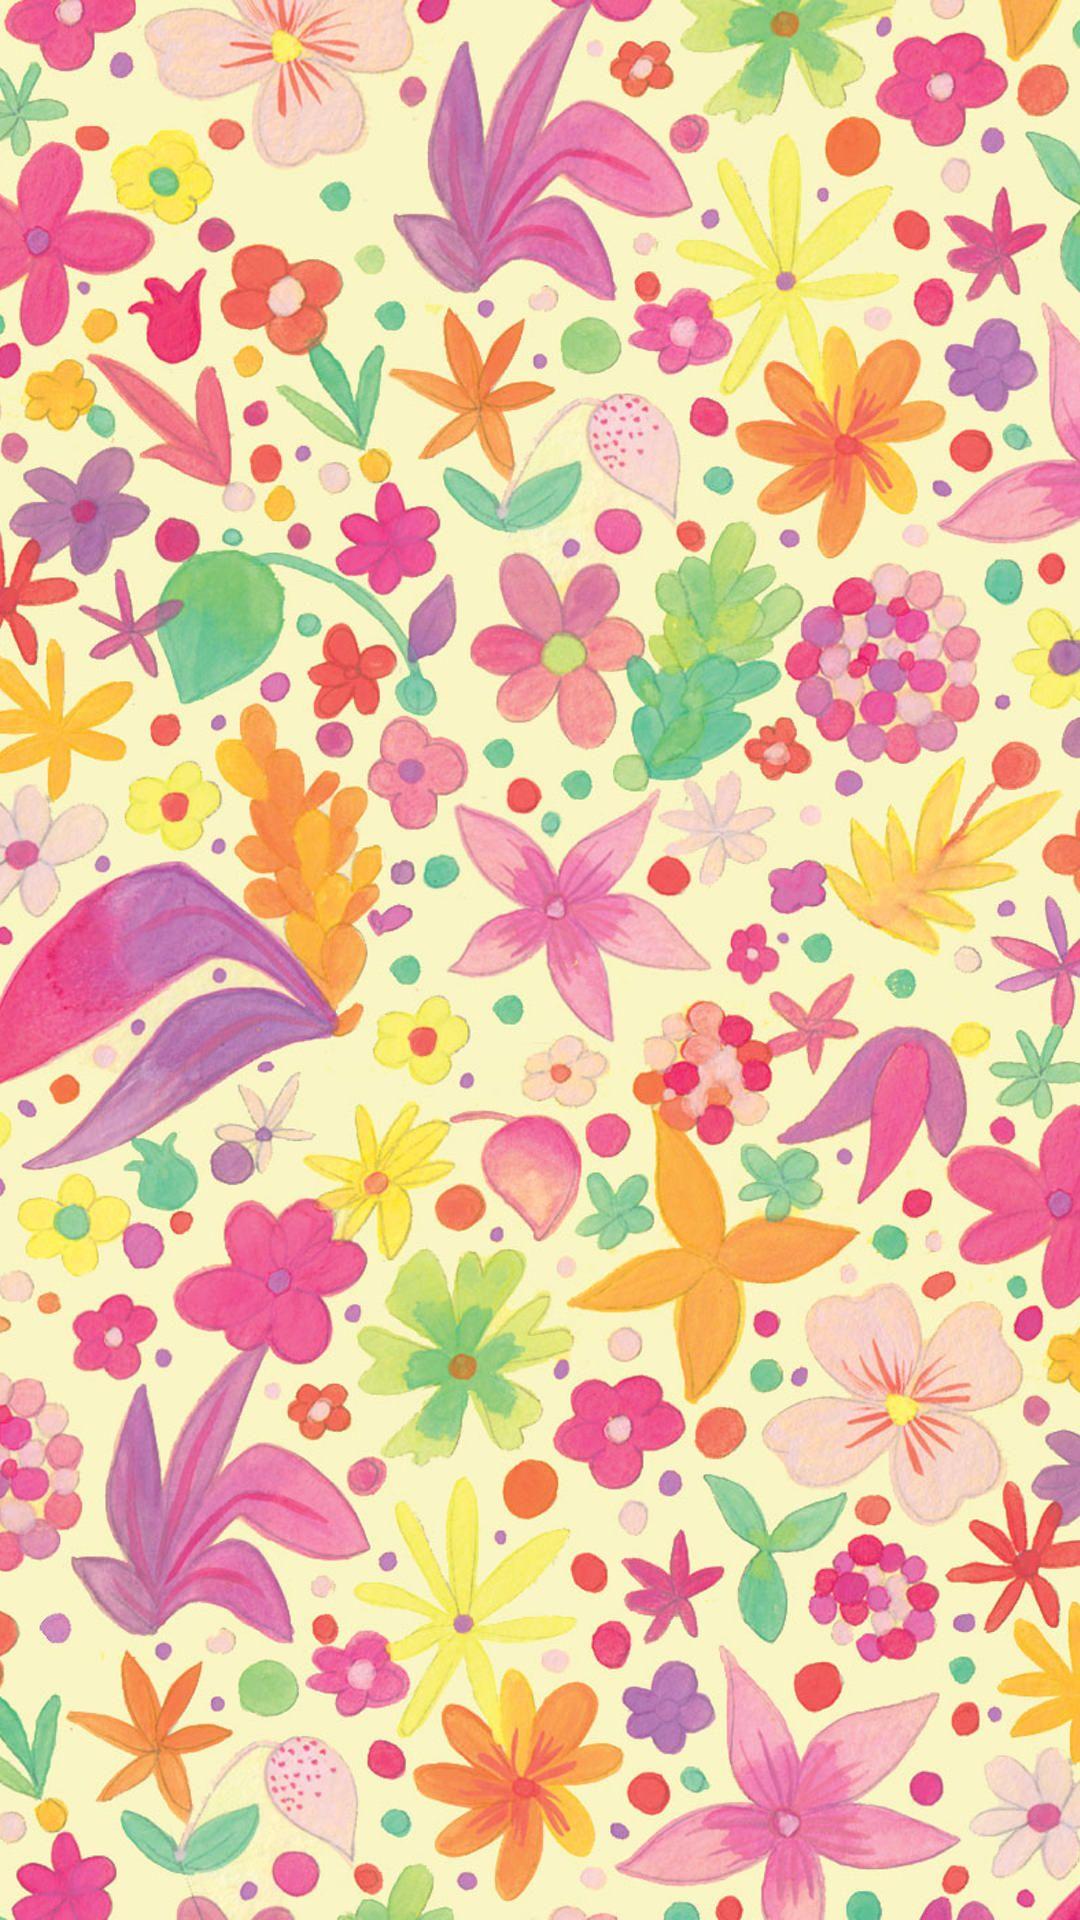 cute wallpapers tumblr floral iphone 6 plus wallpaper